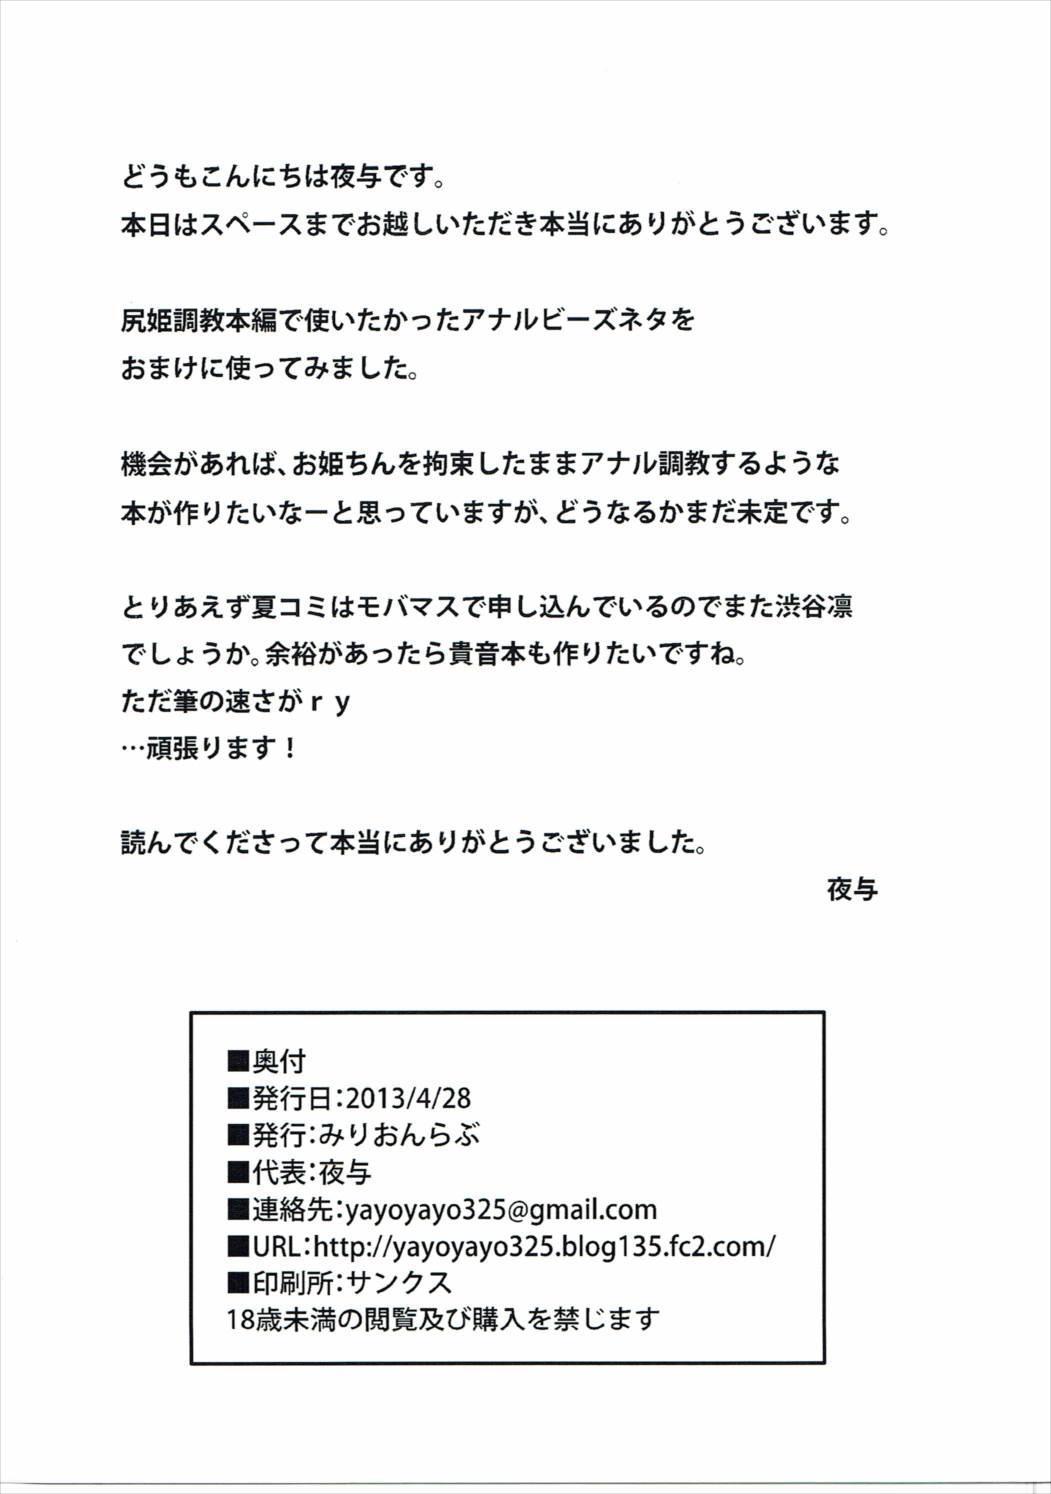 Shirihime Choukyou Omake 3